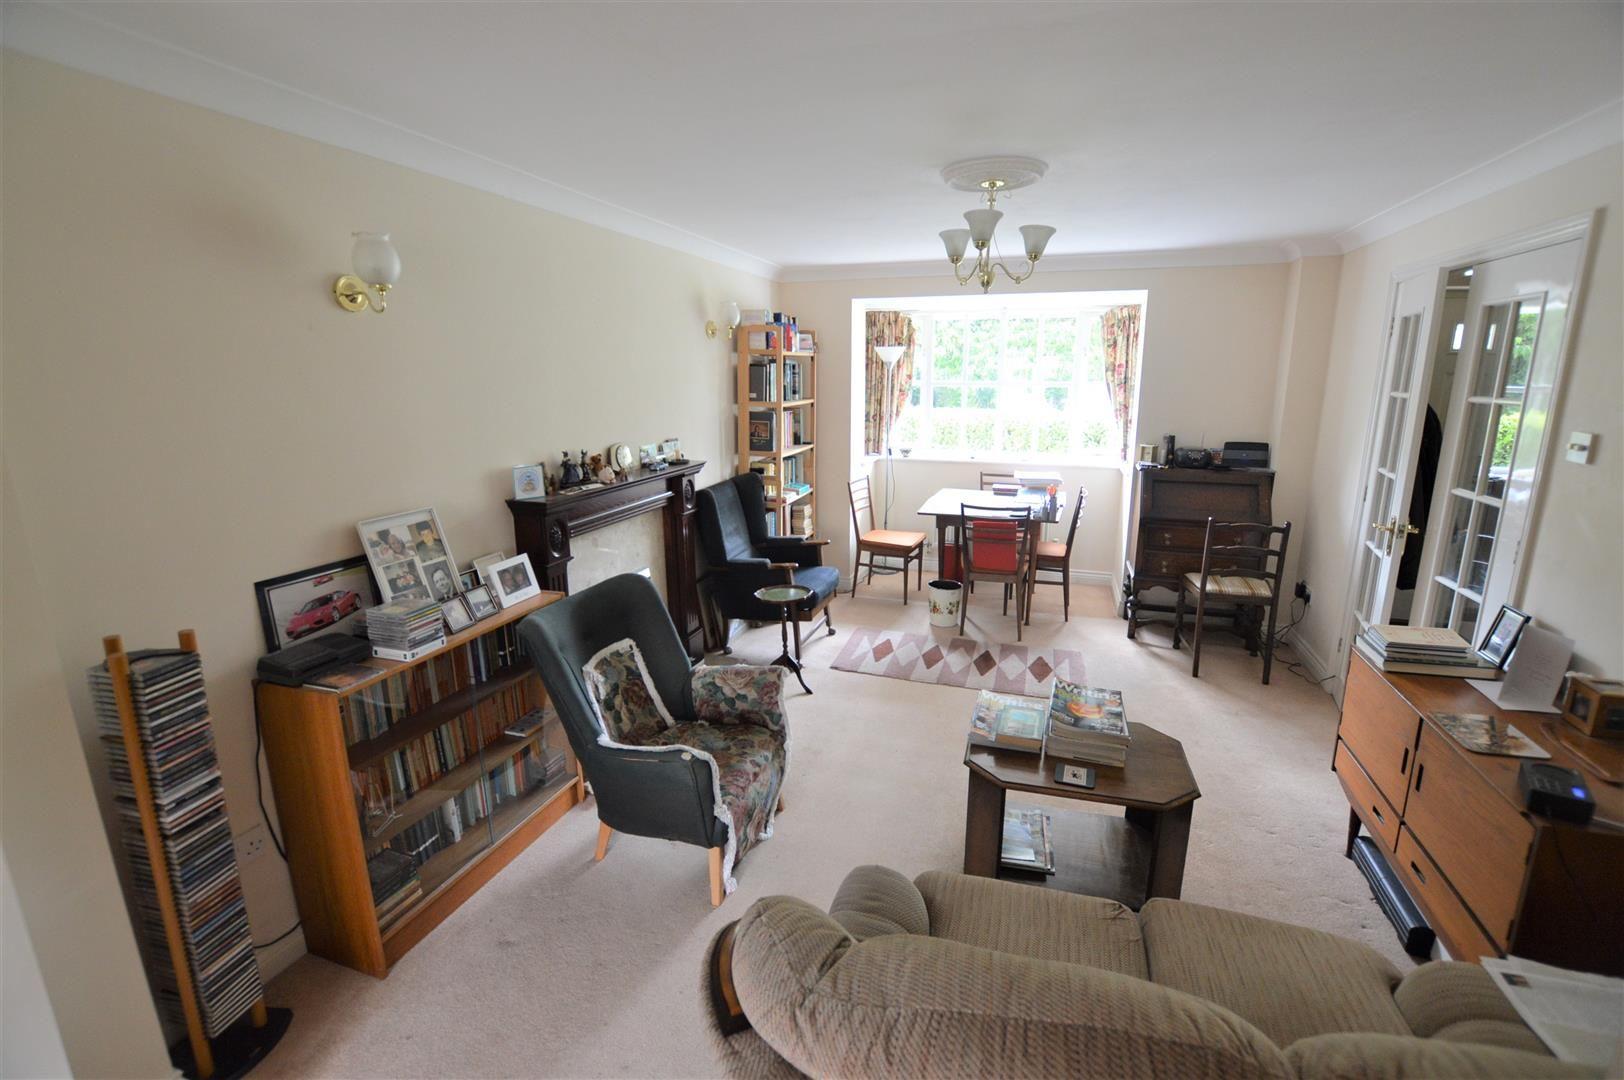 3 bed terraced for sale in Eardisley  - Property Image 3